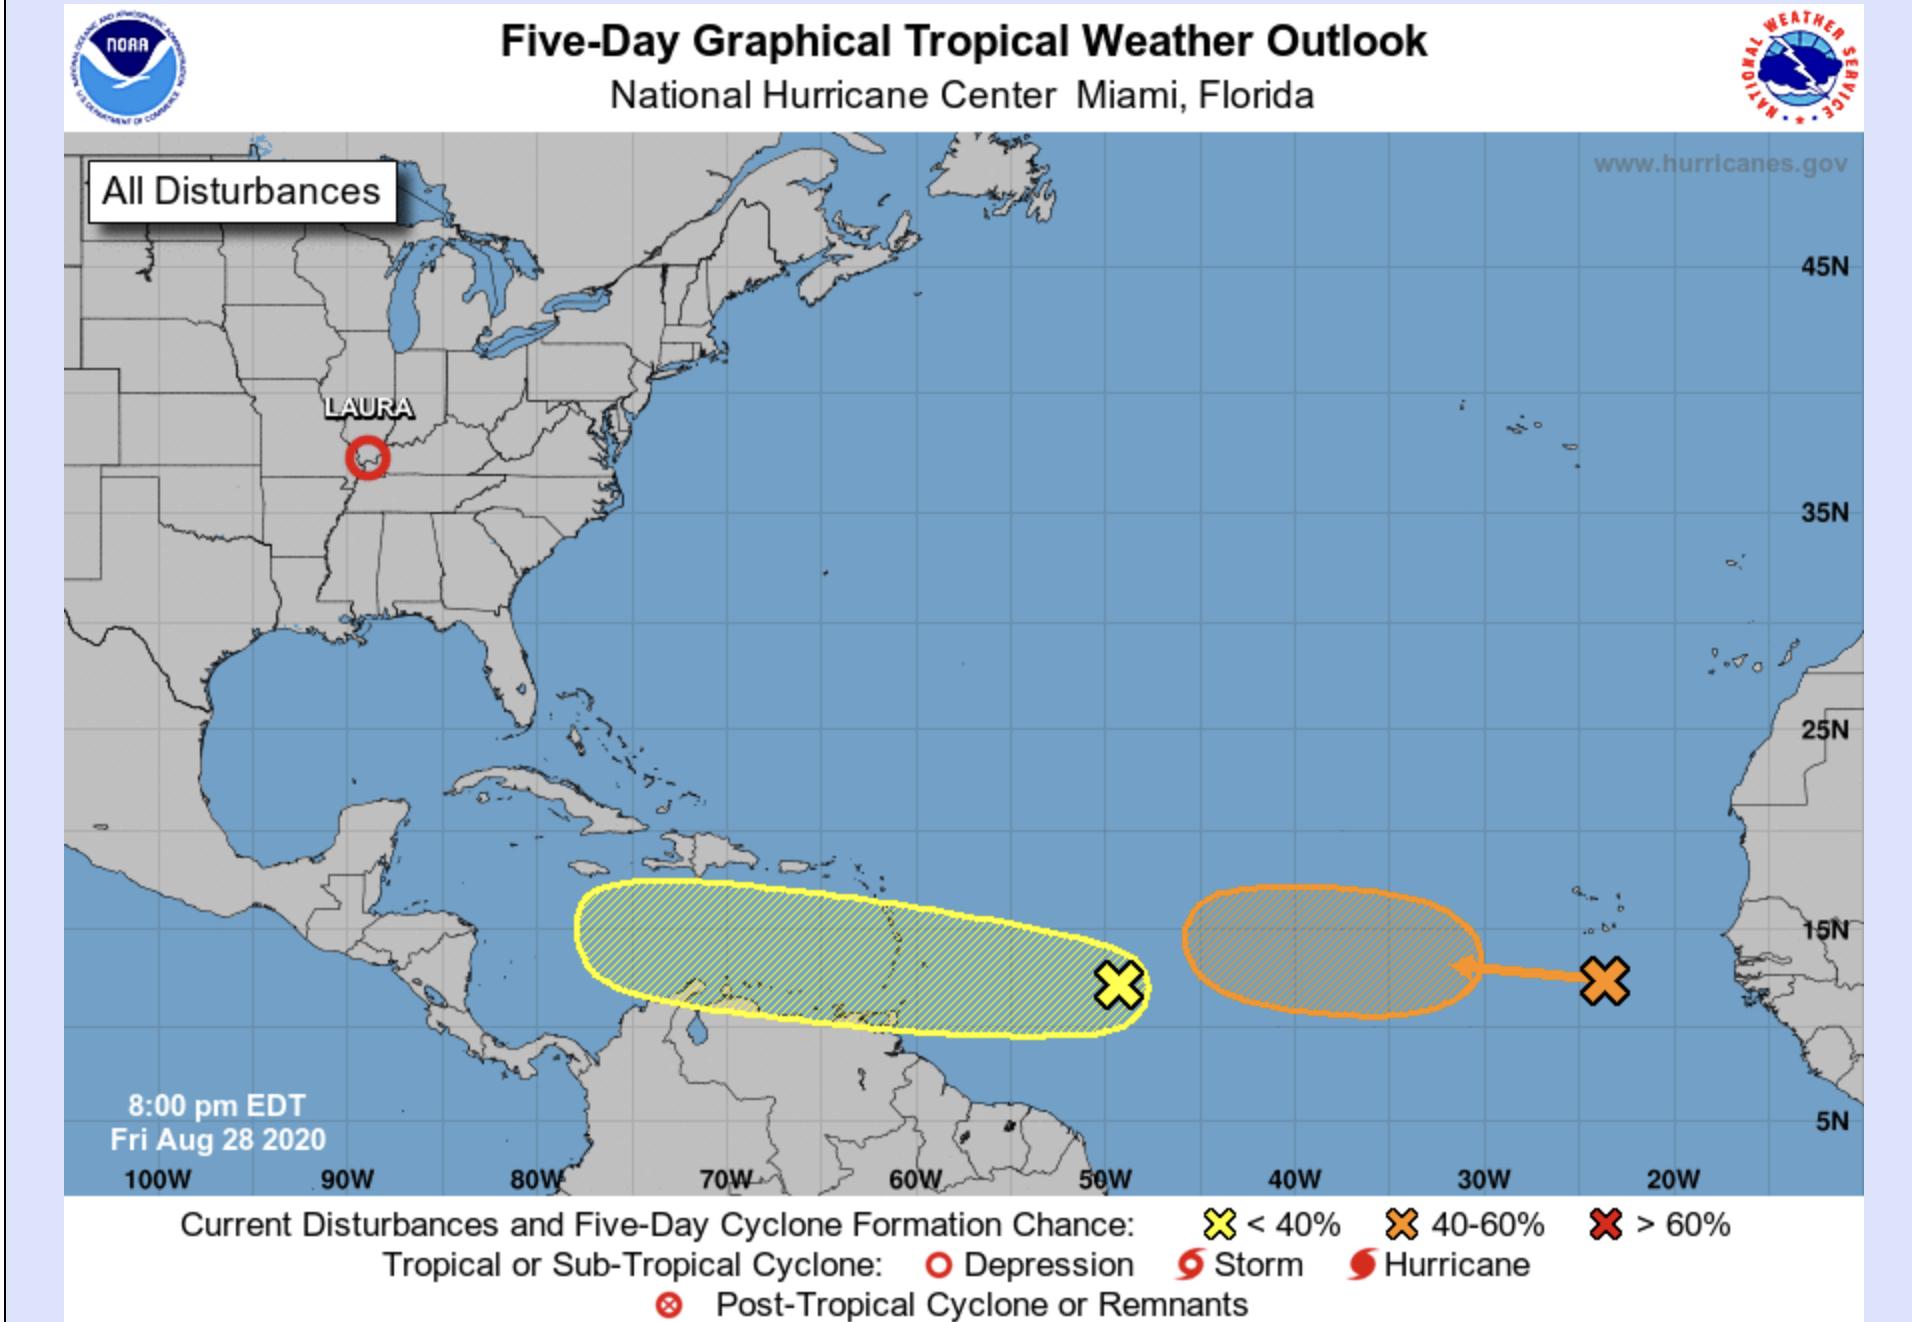 8p national hurricane center august 28 2020